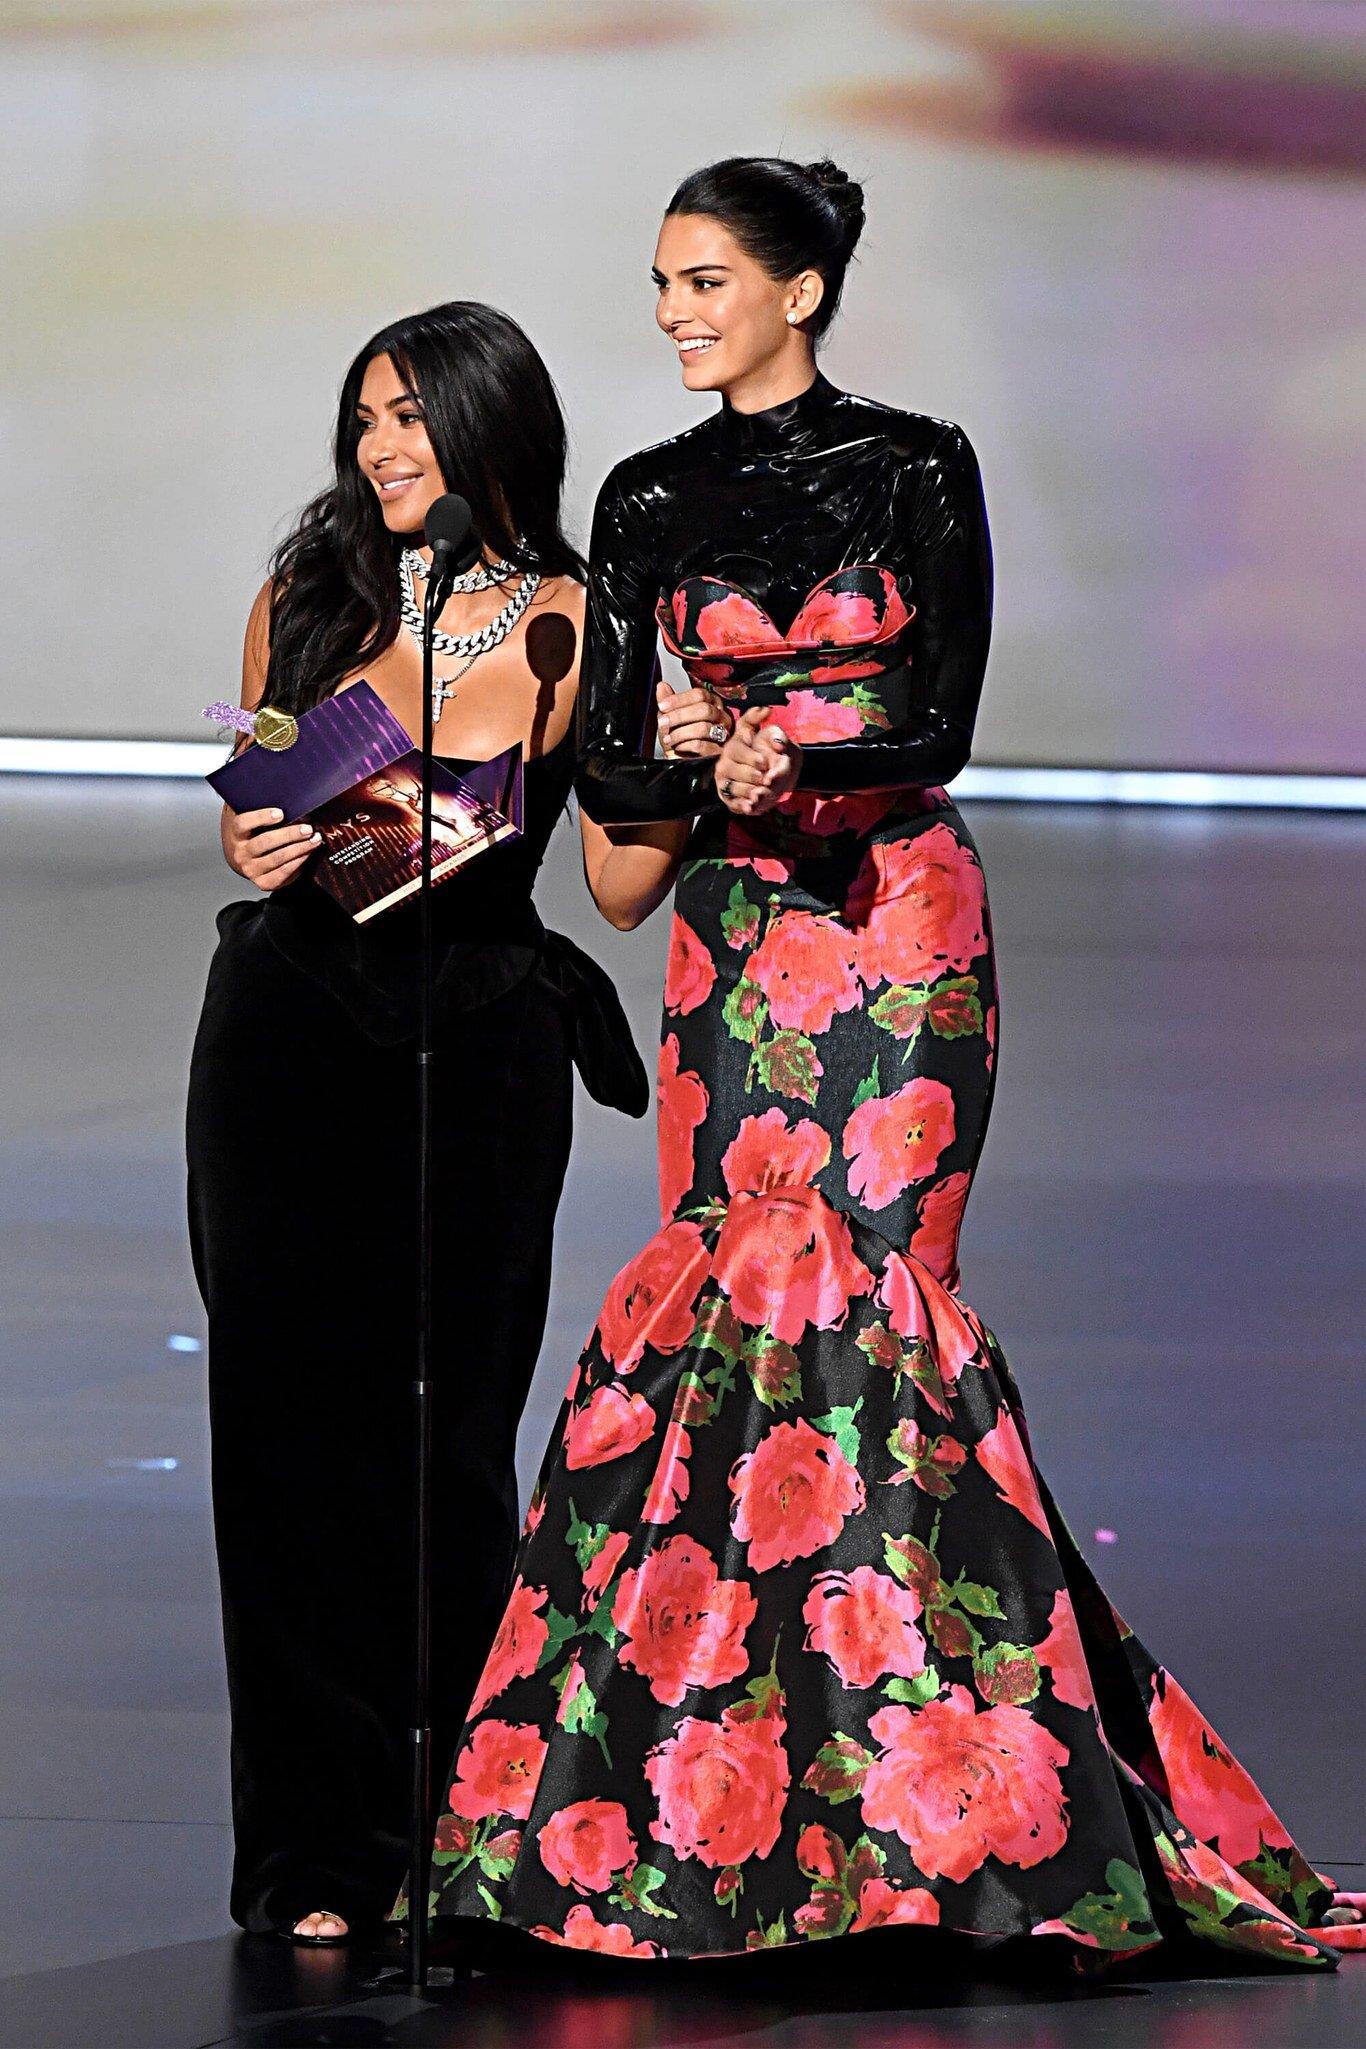 Kardashian-Jenners launch Kardashian Kloset resale platform.